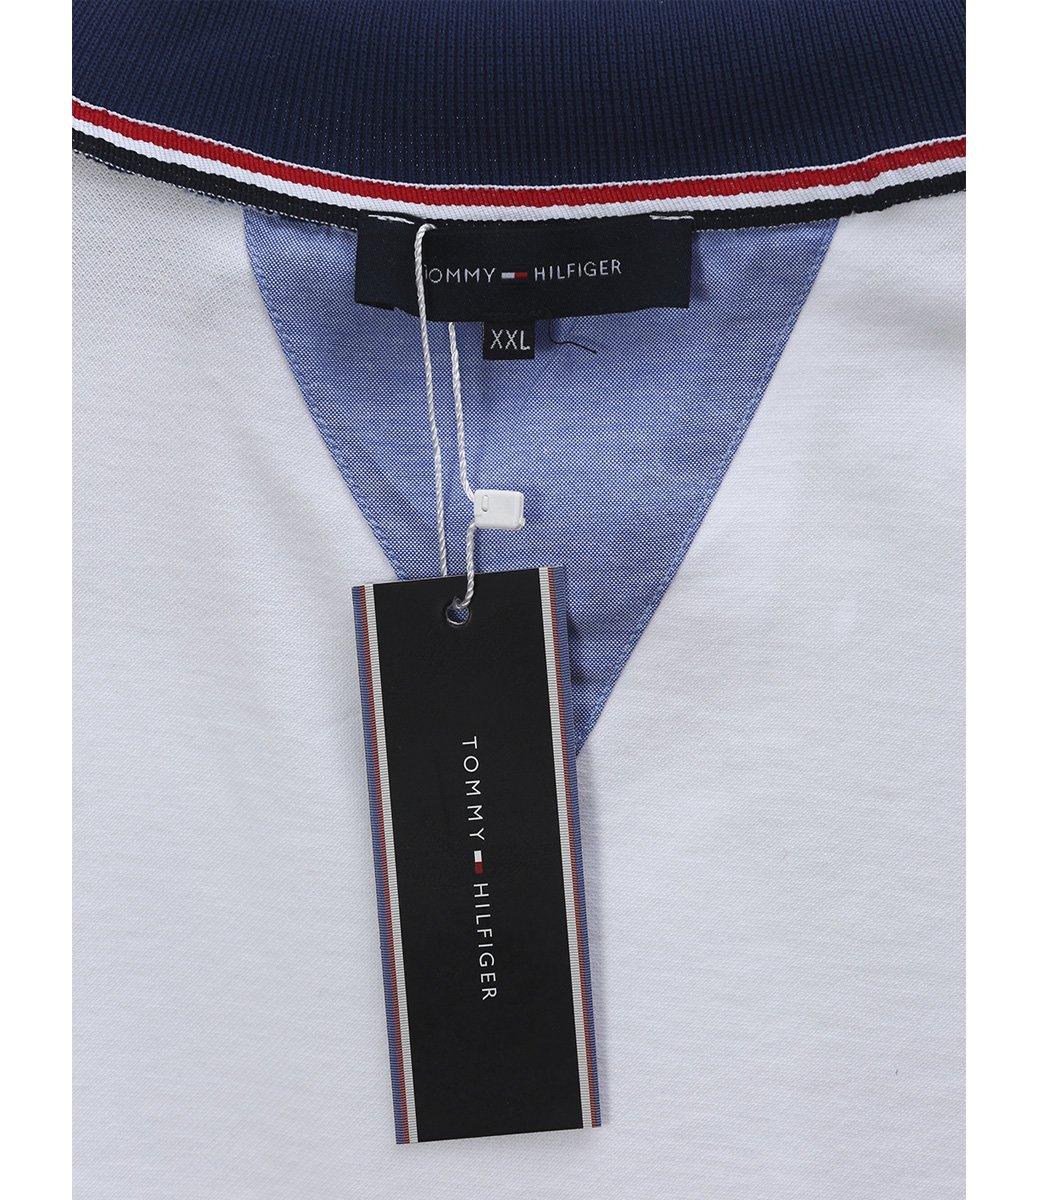 Белая футболка поло Tommy Hilfiger с синим воротником TH4